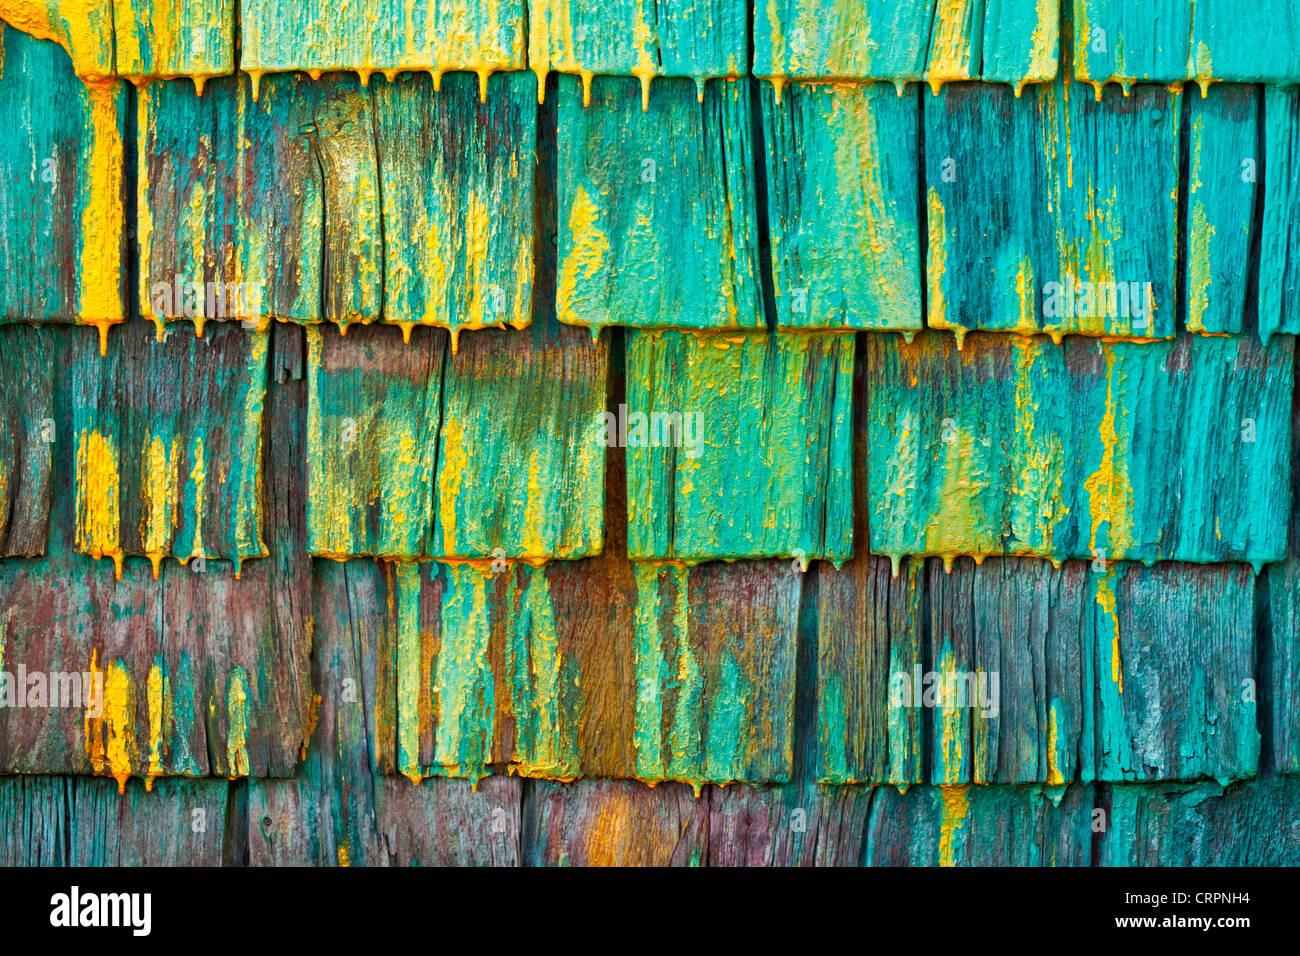 Shingled wall of a fisherman's shed in Nova Scotia, Canada. Stock Foto